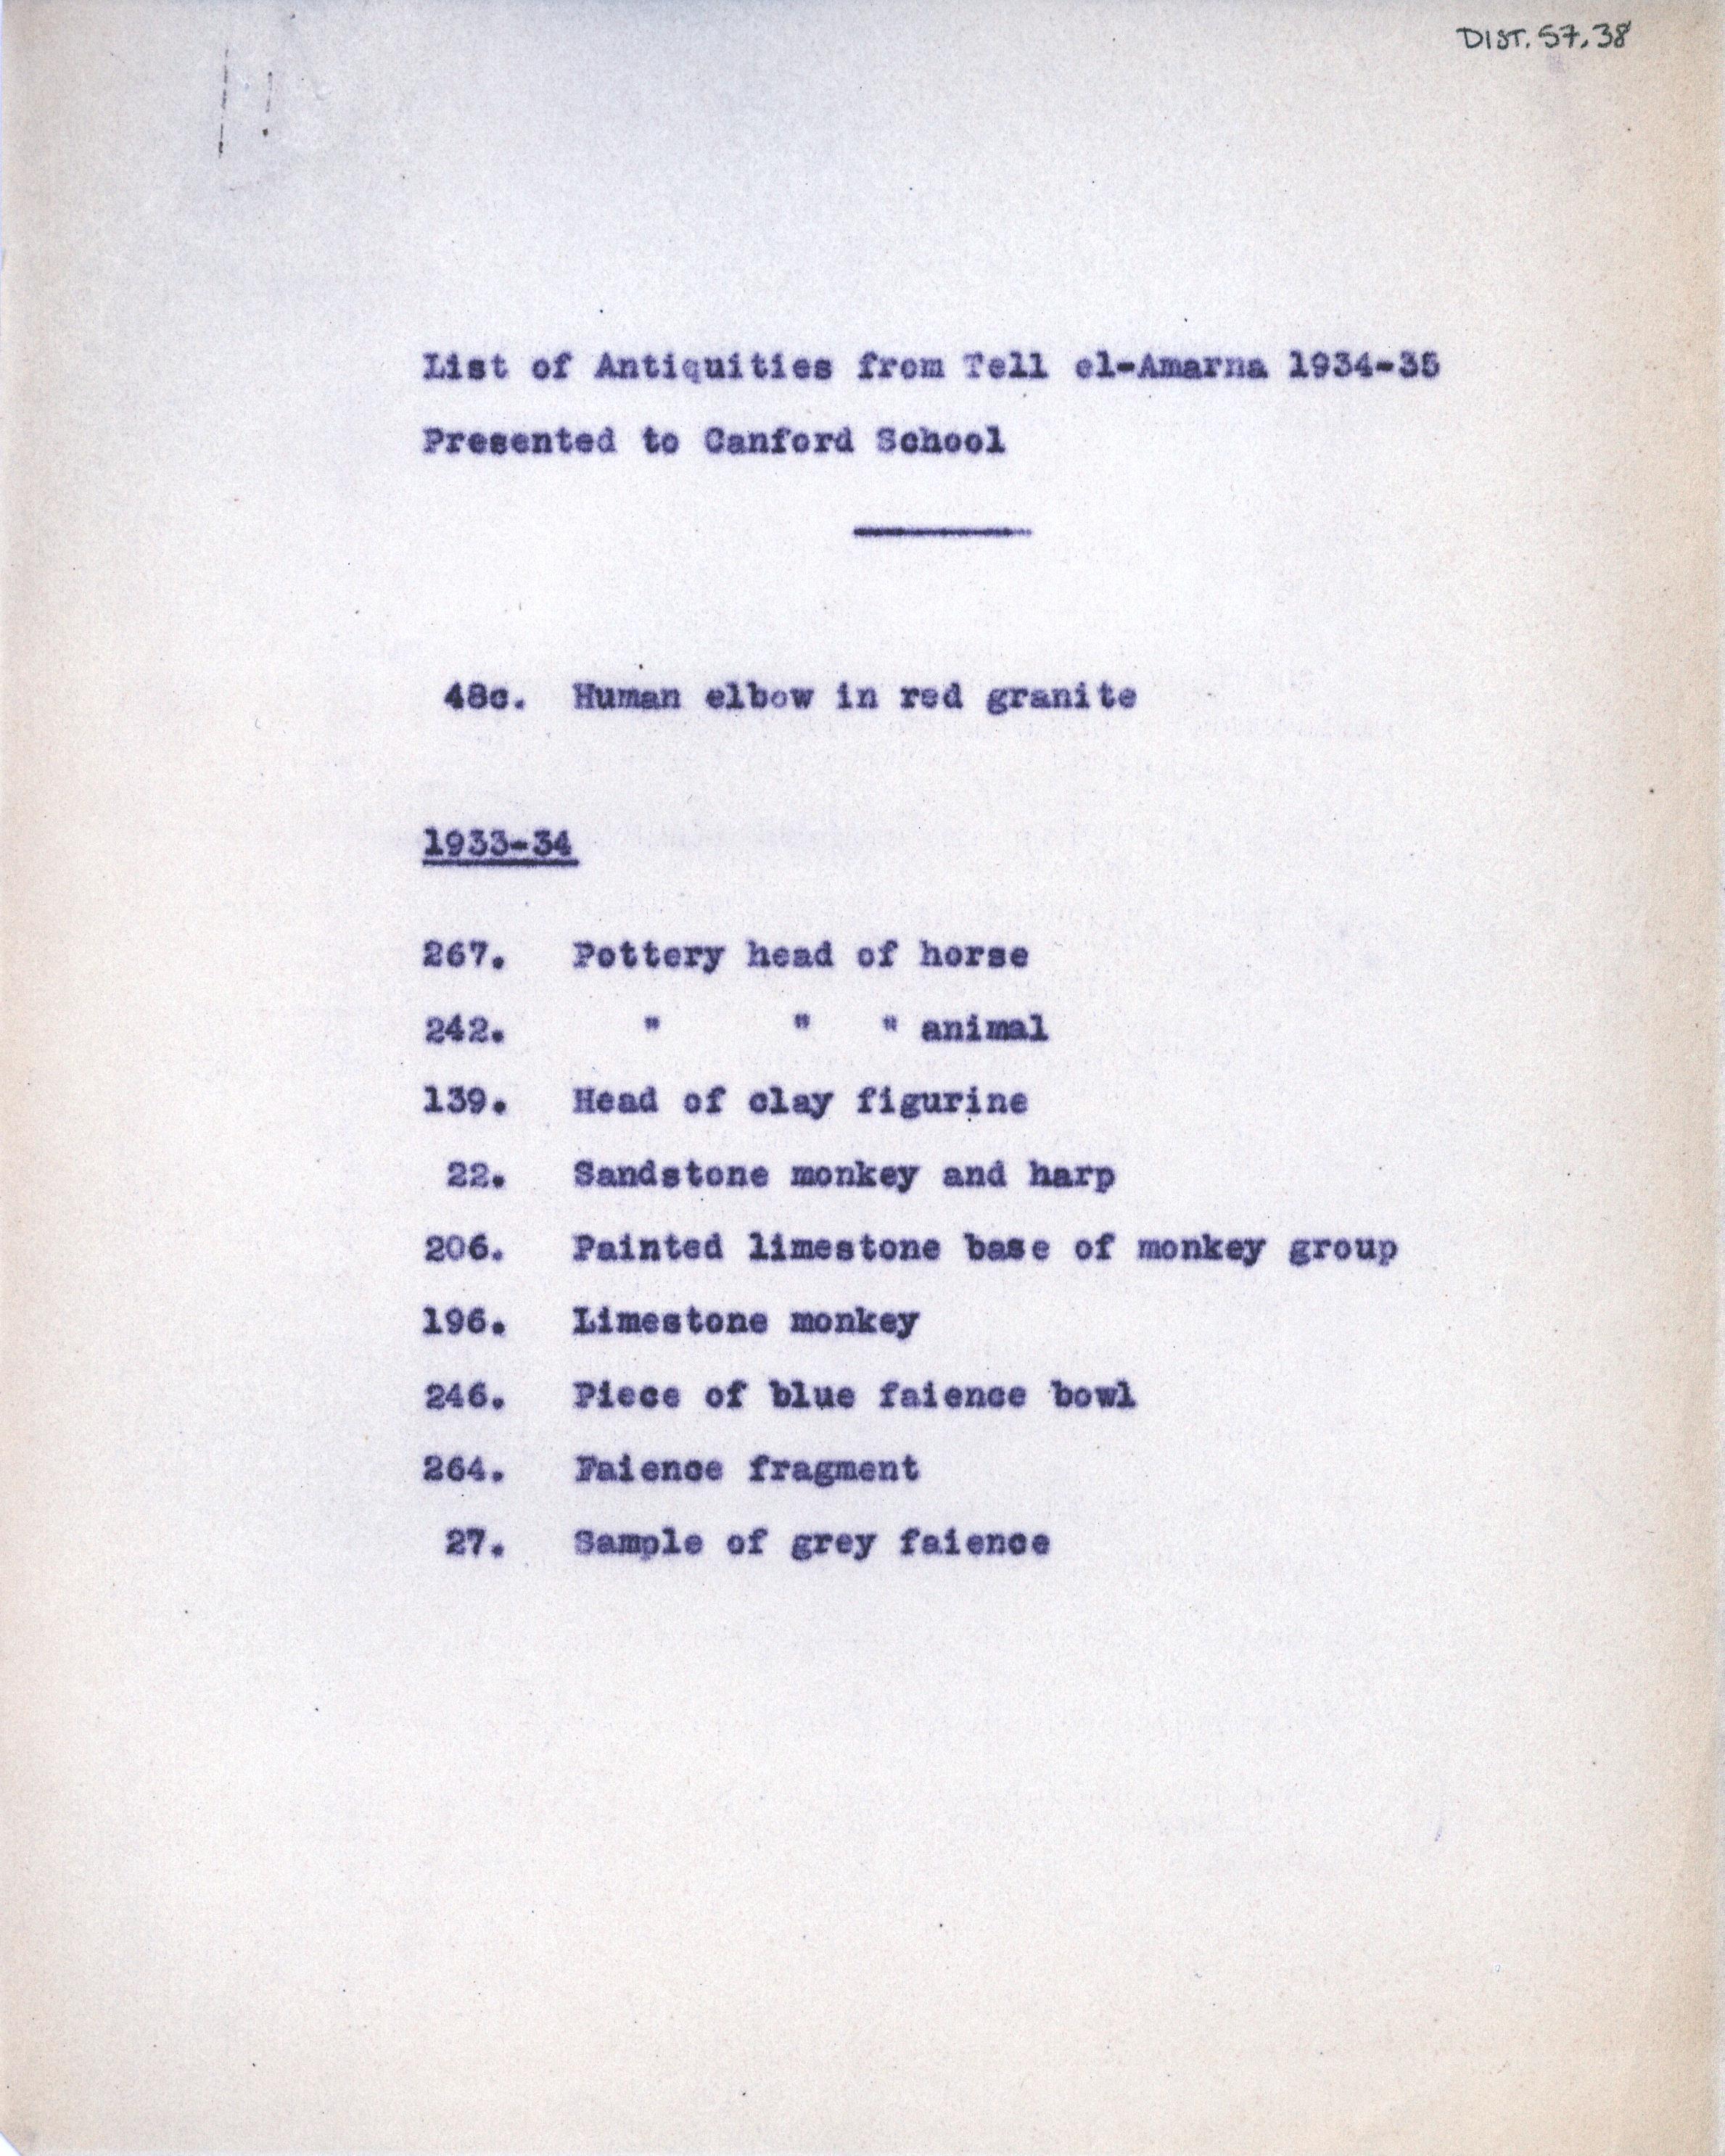 1931-34 el-Amarna DIST.57.38